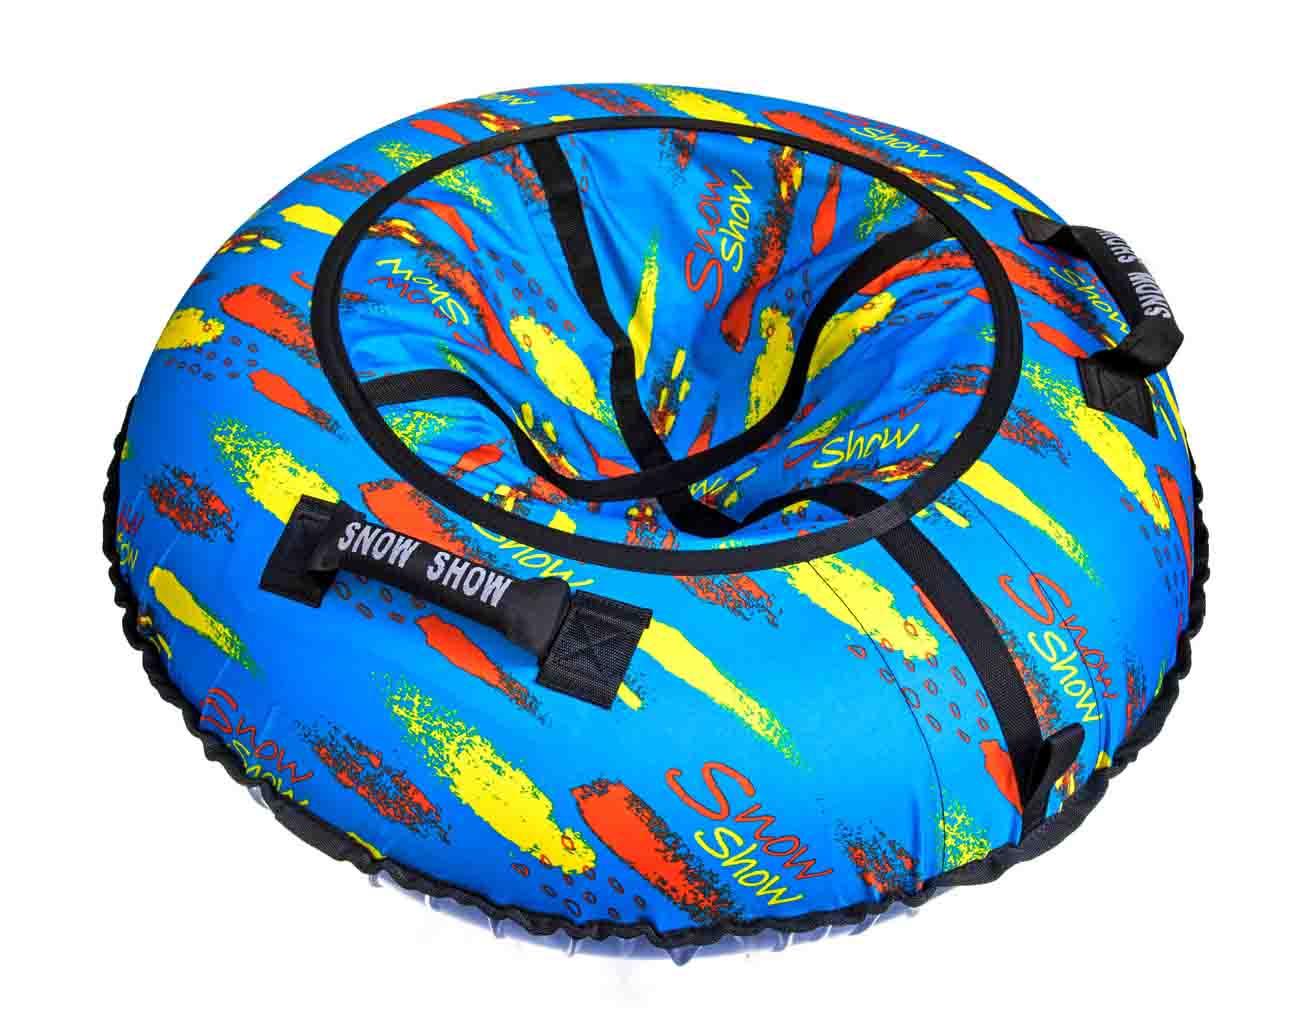 Санки надувные – Тюбинг RT Краски на голубом, 105 см фото